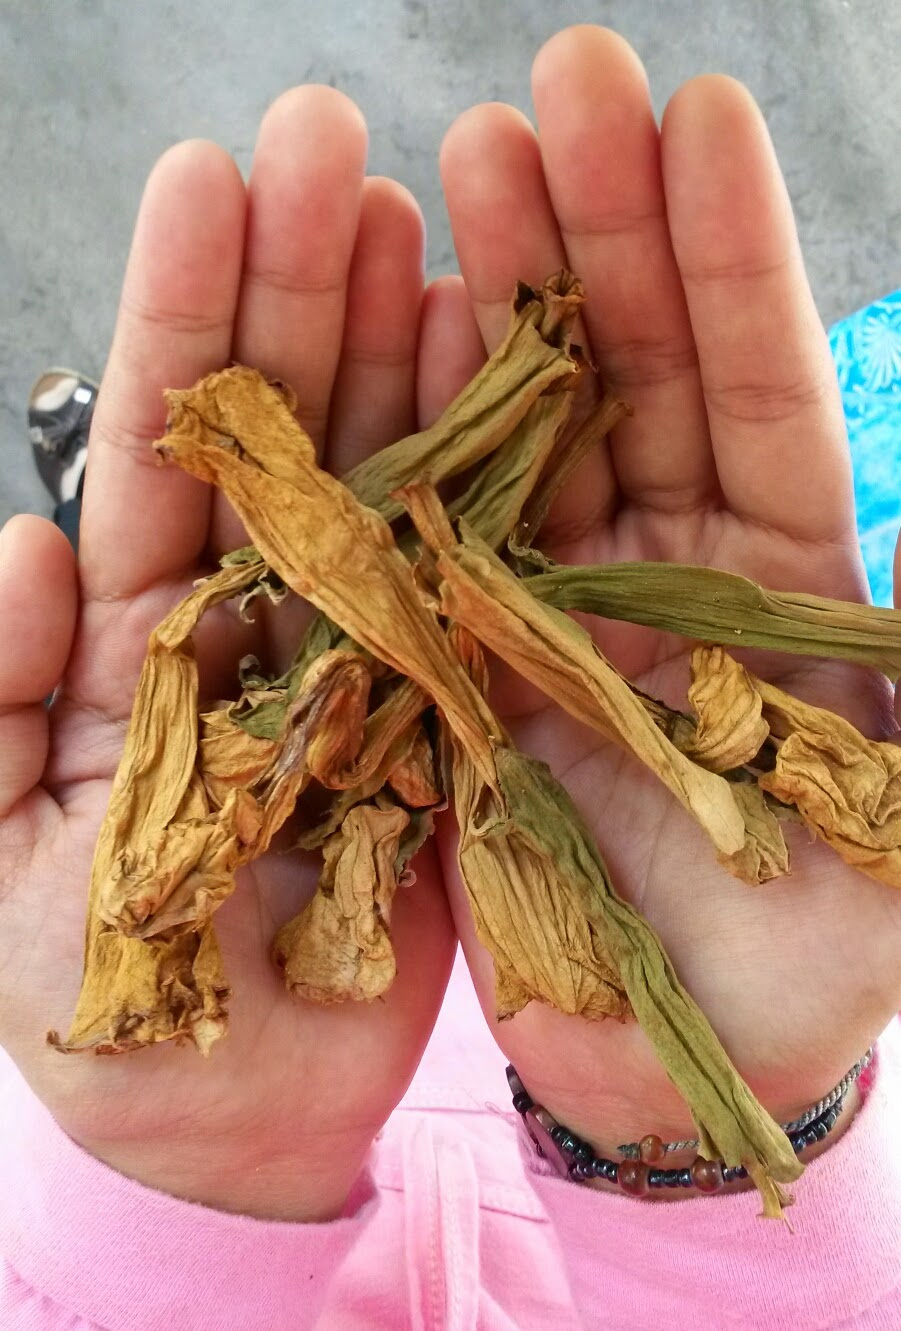 Rumah Herba & Akar kayu, resdung, tradisional medicine, temperungak, kecubung